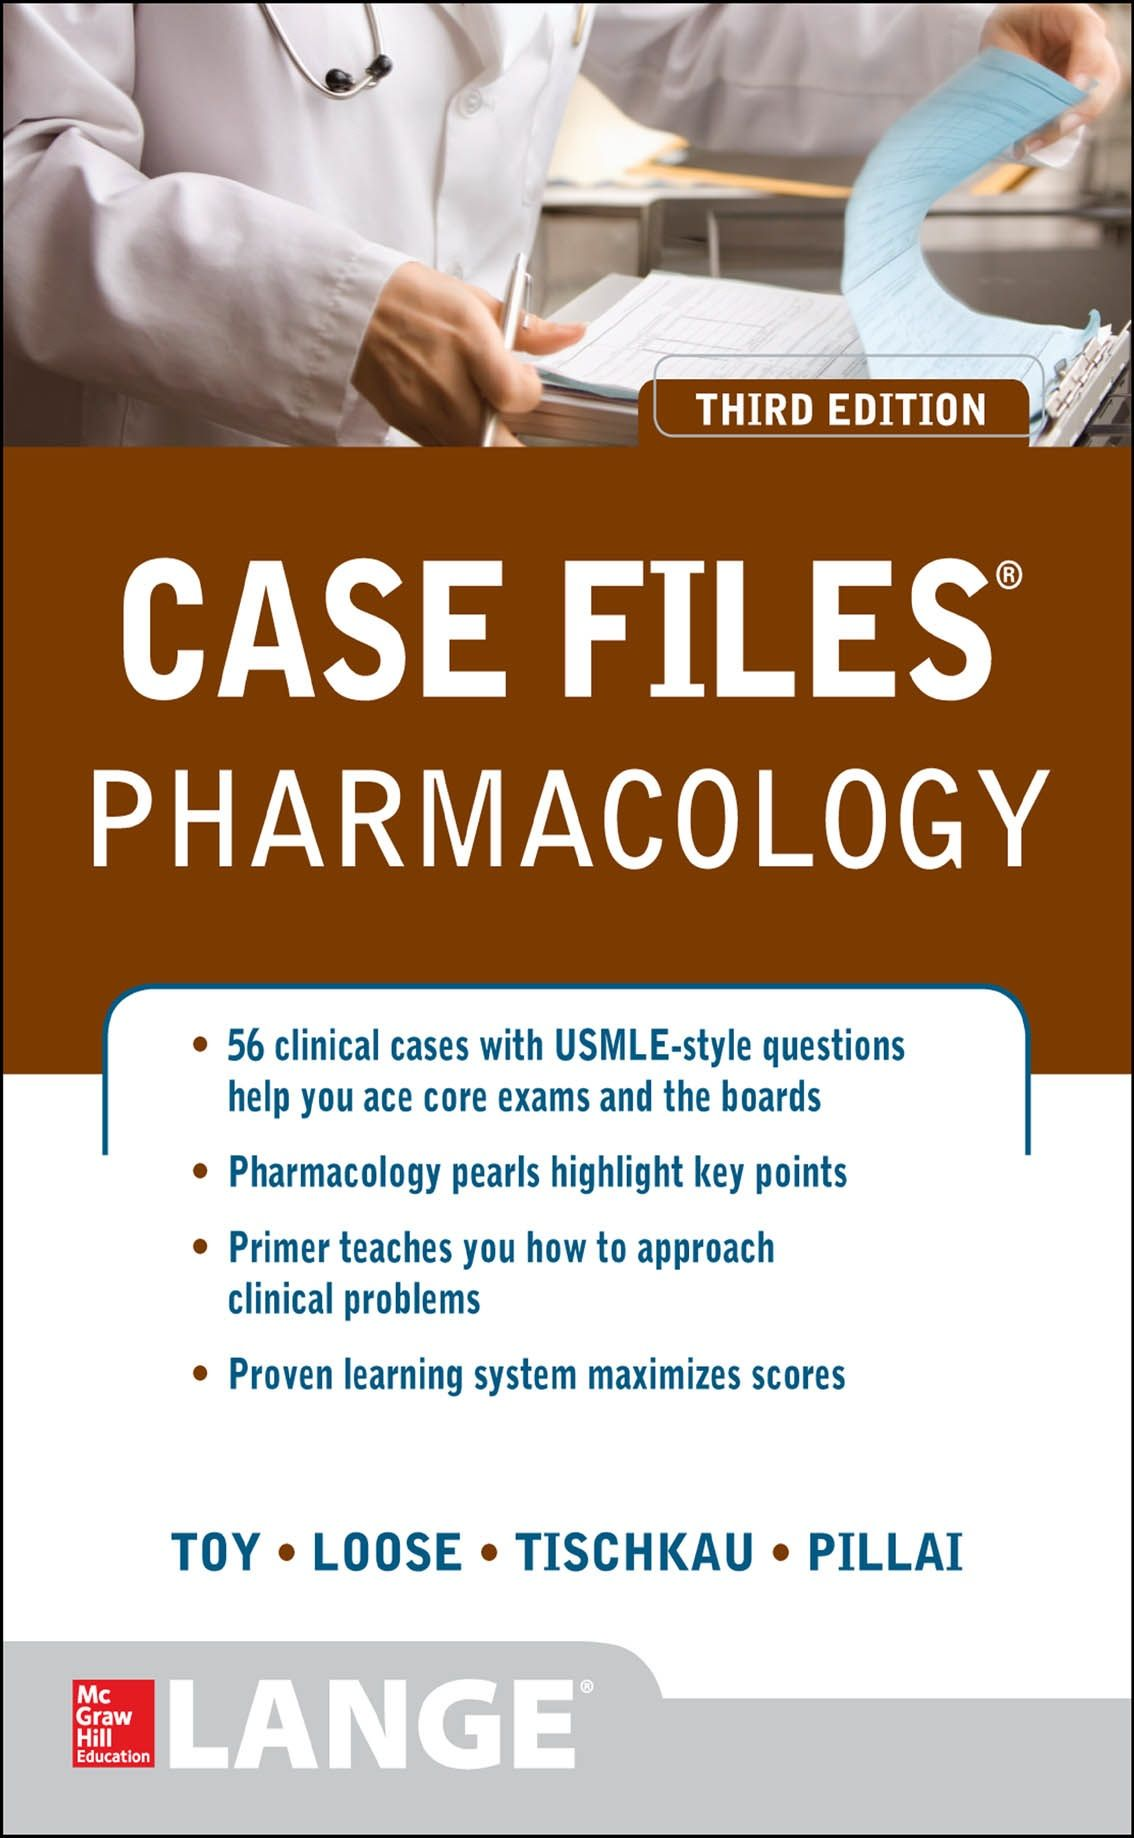 Case Files Pharmacology 3rd Edition PDF | Medicine | Pinterest ...